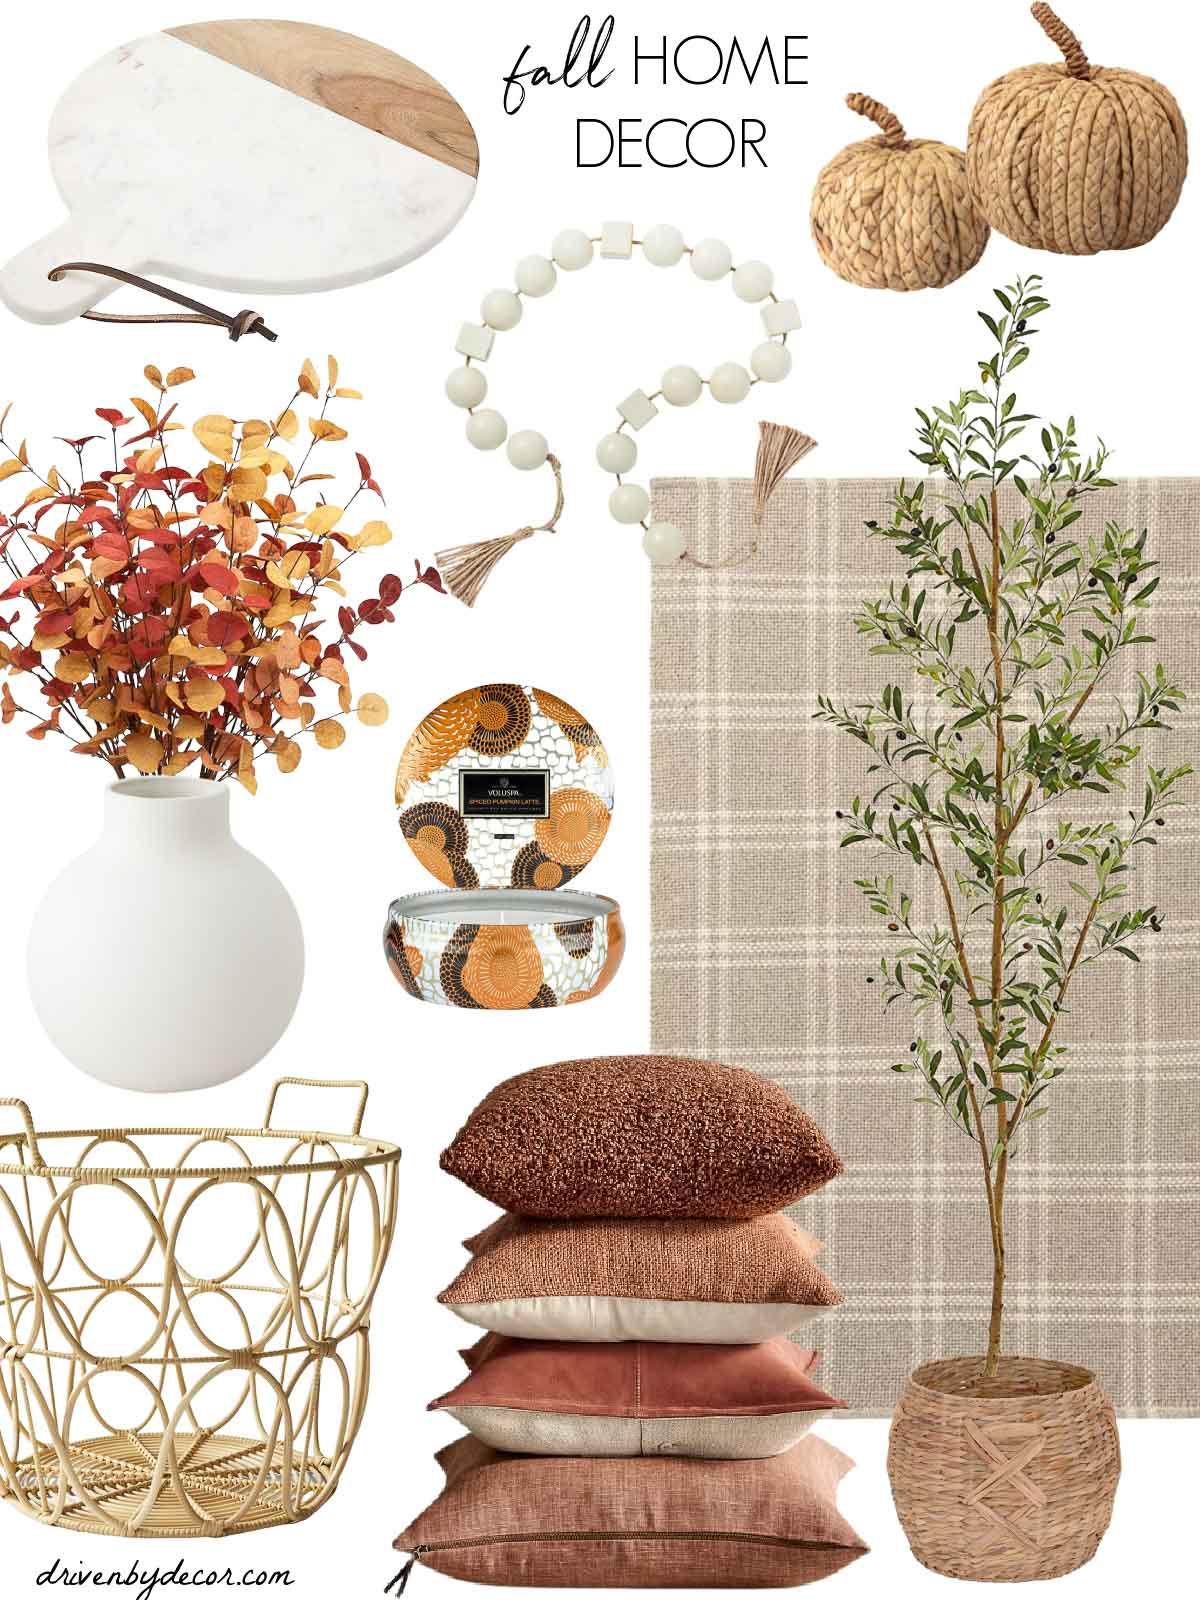 Fall home decor favorites!